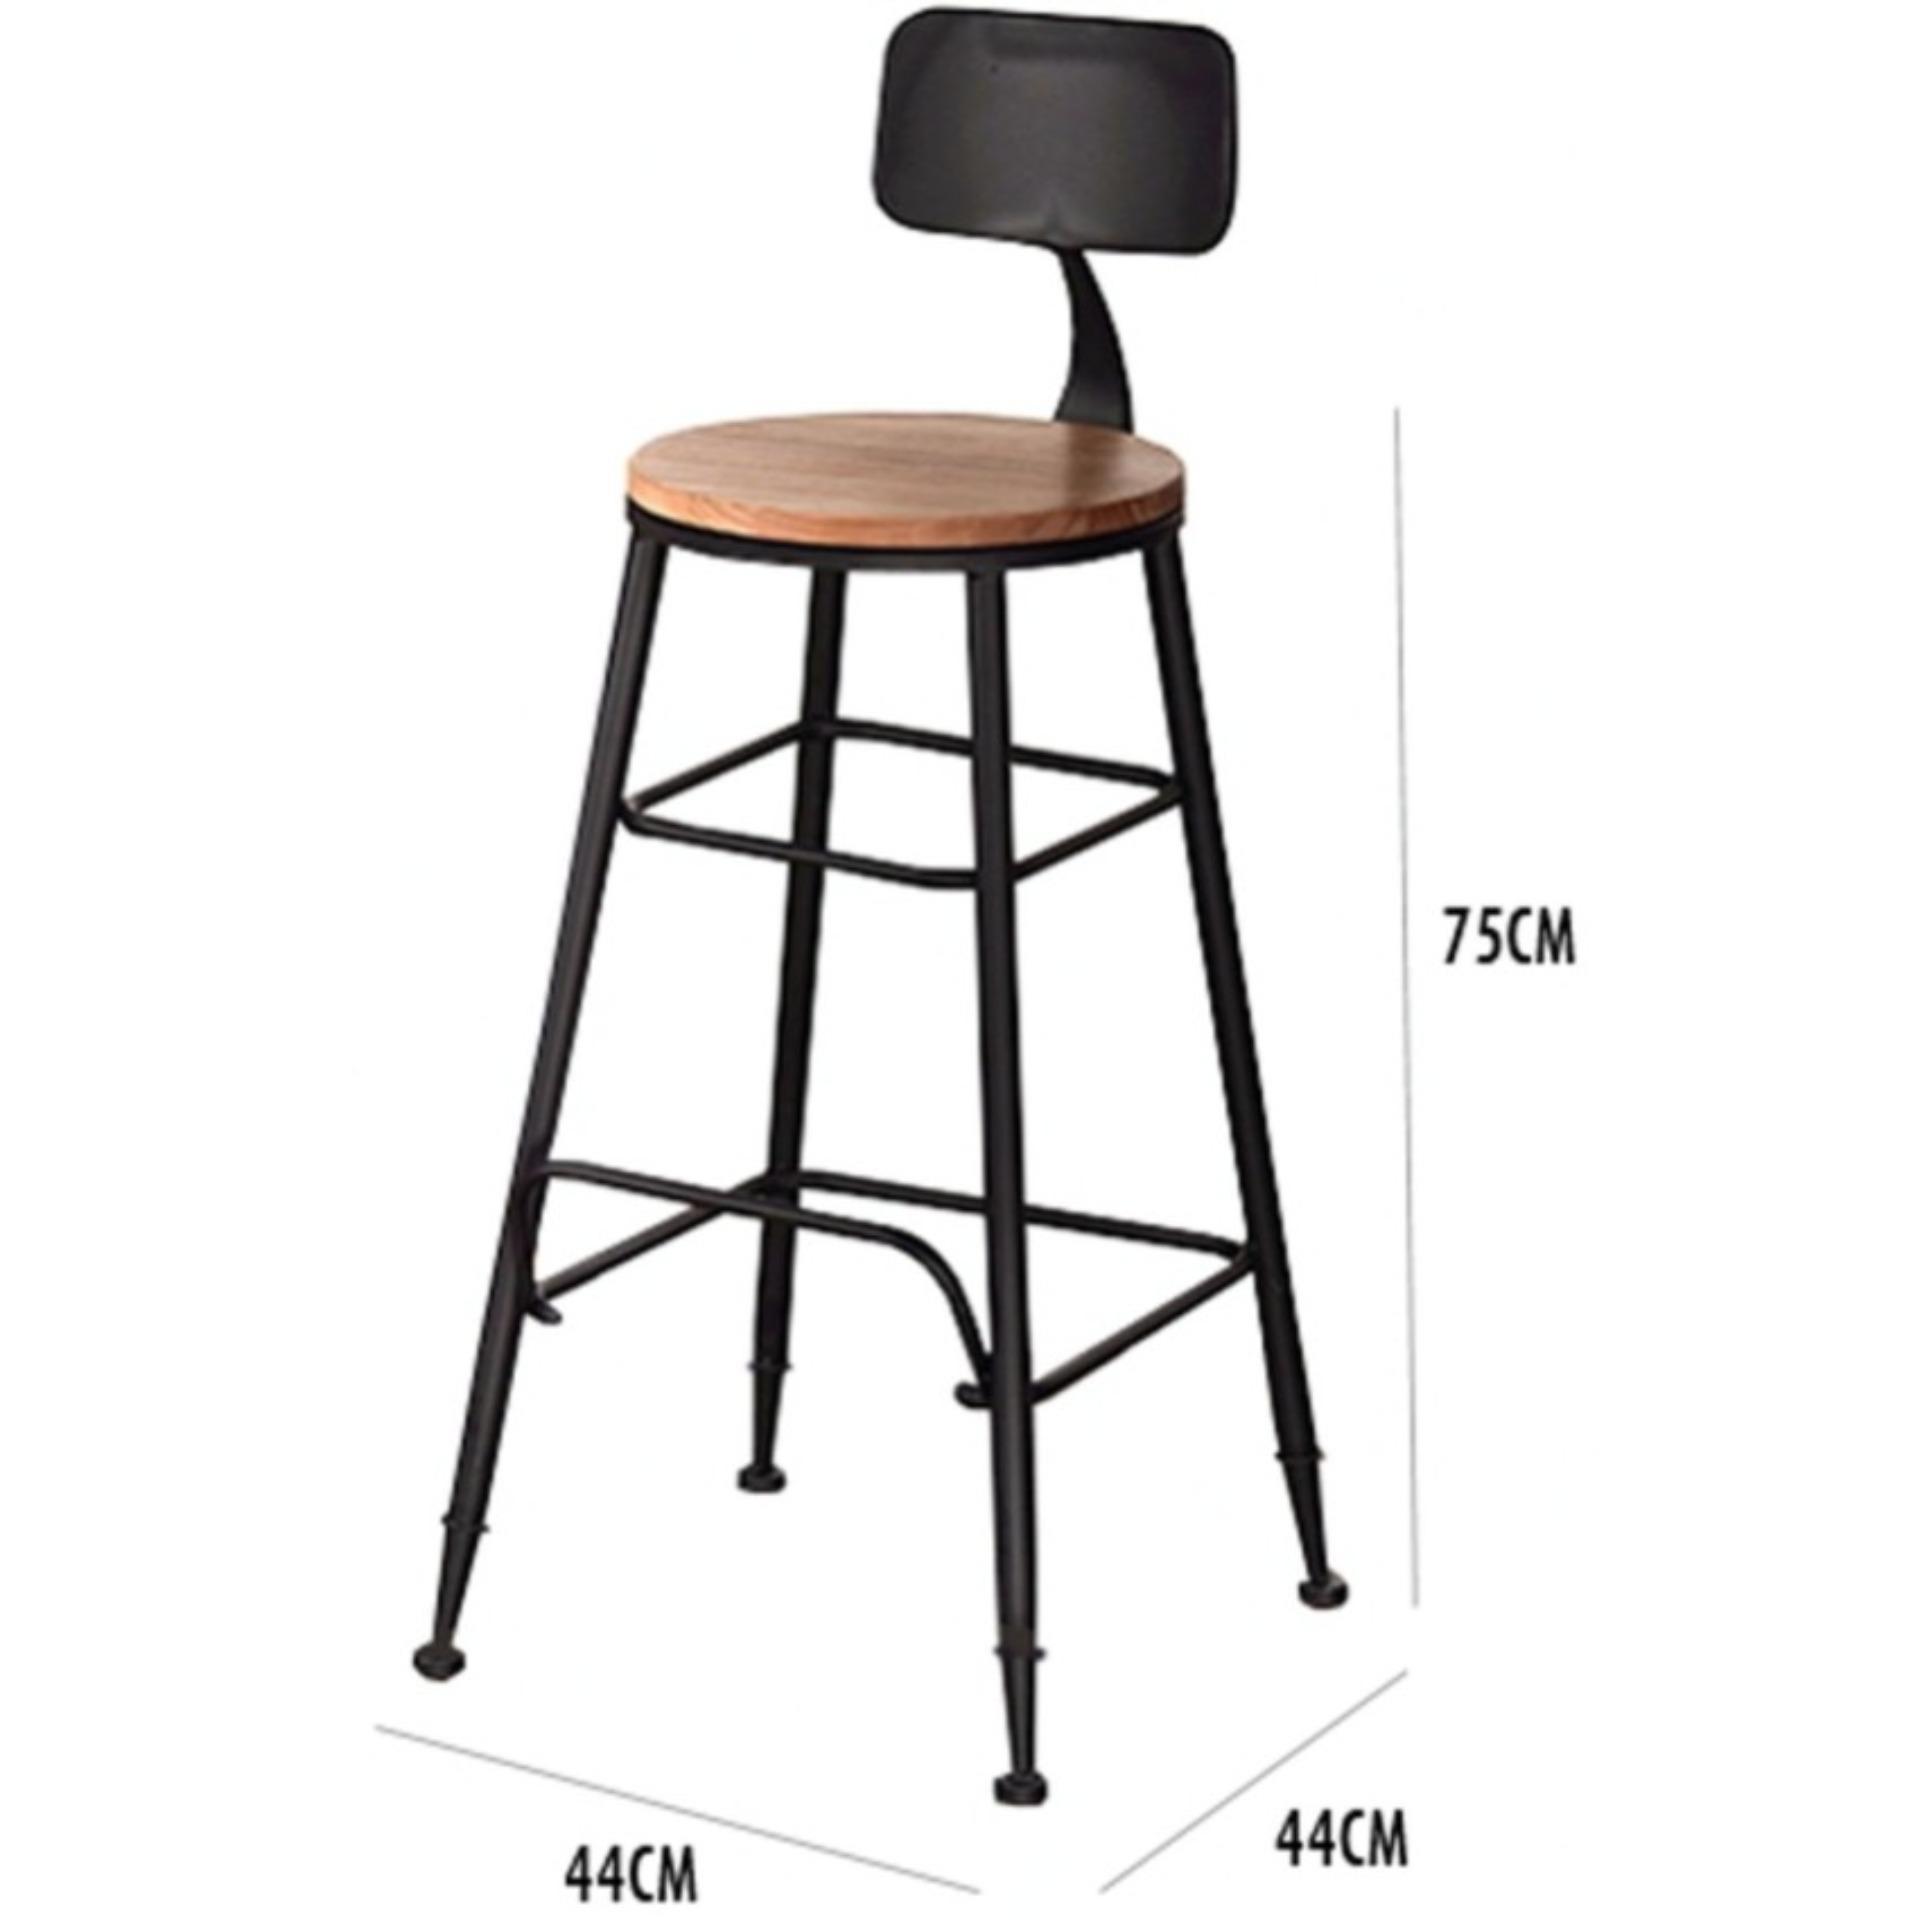 Retro High Chair Stools Bar Stool 75cm